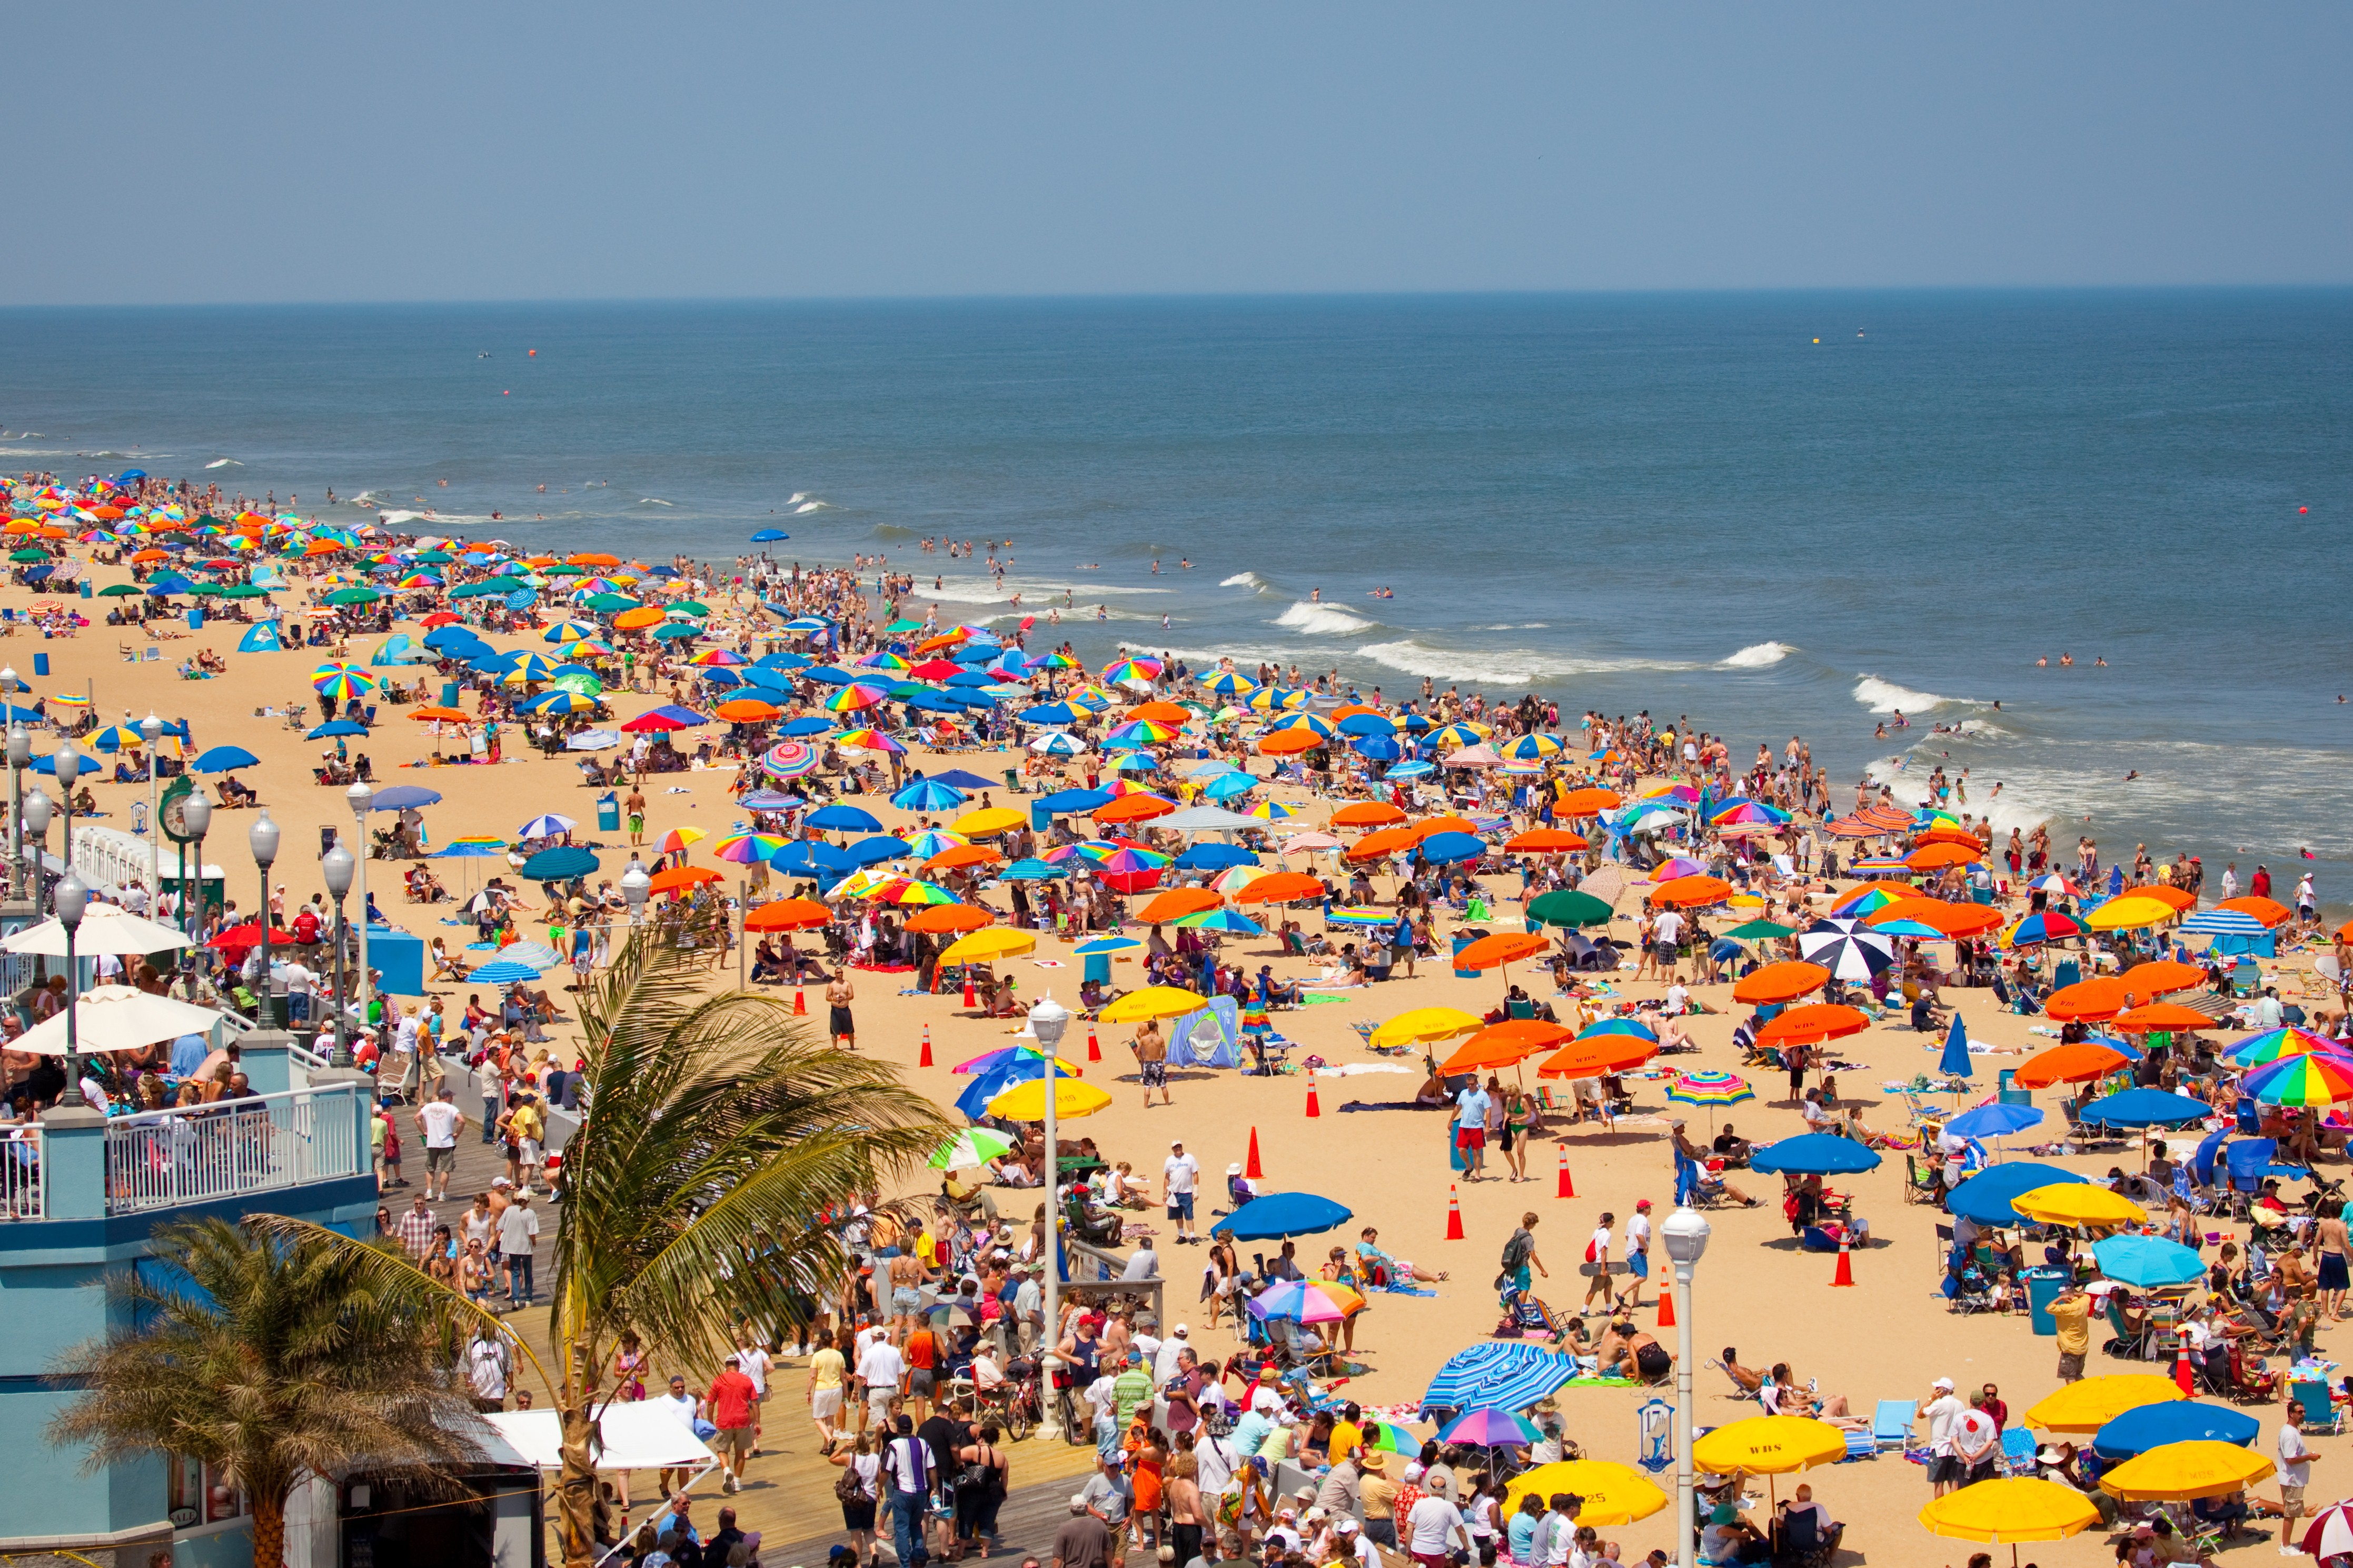 Ocean City United States Tourist Beach Wallpaper HD Wallpapers 4469x2979